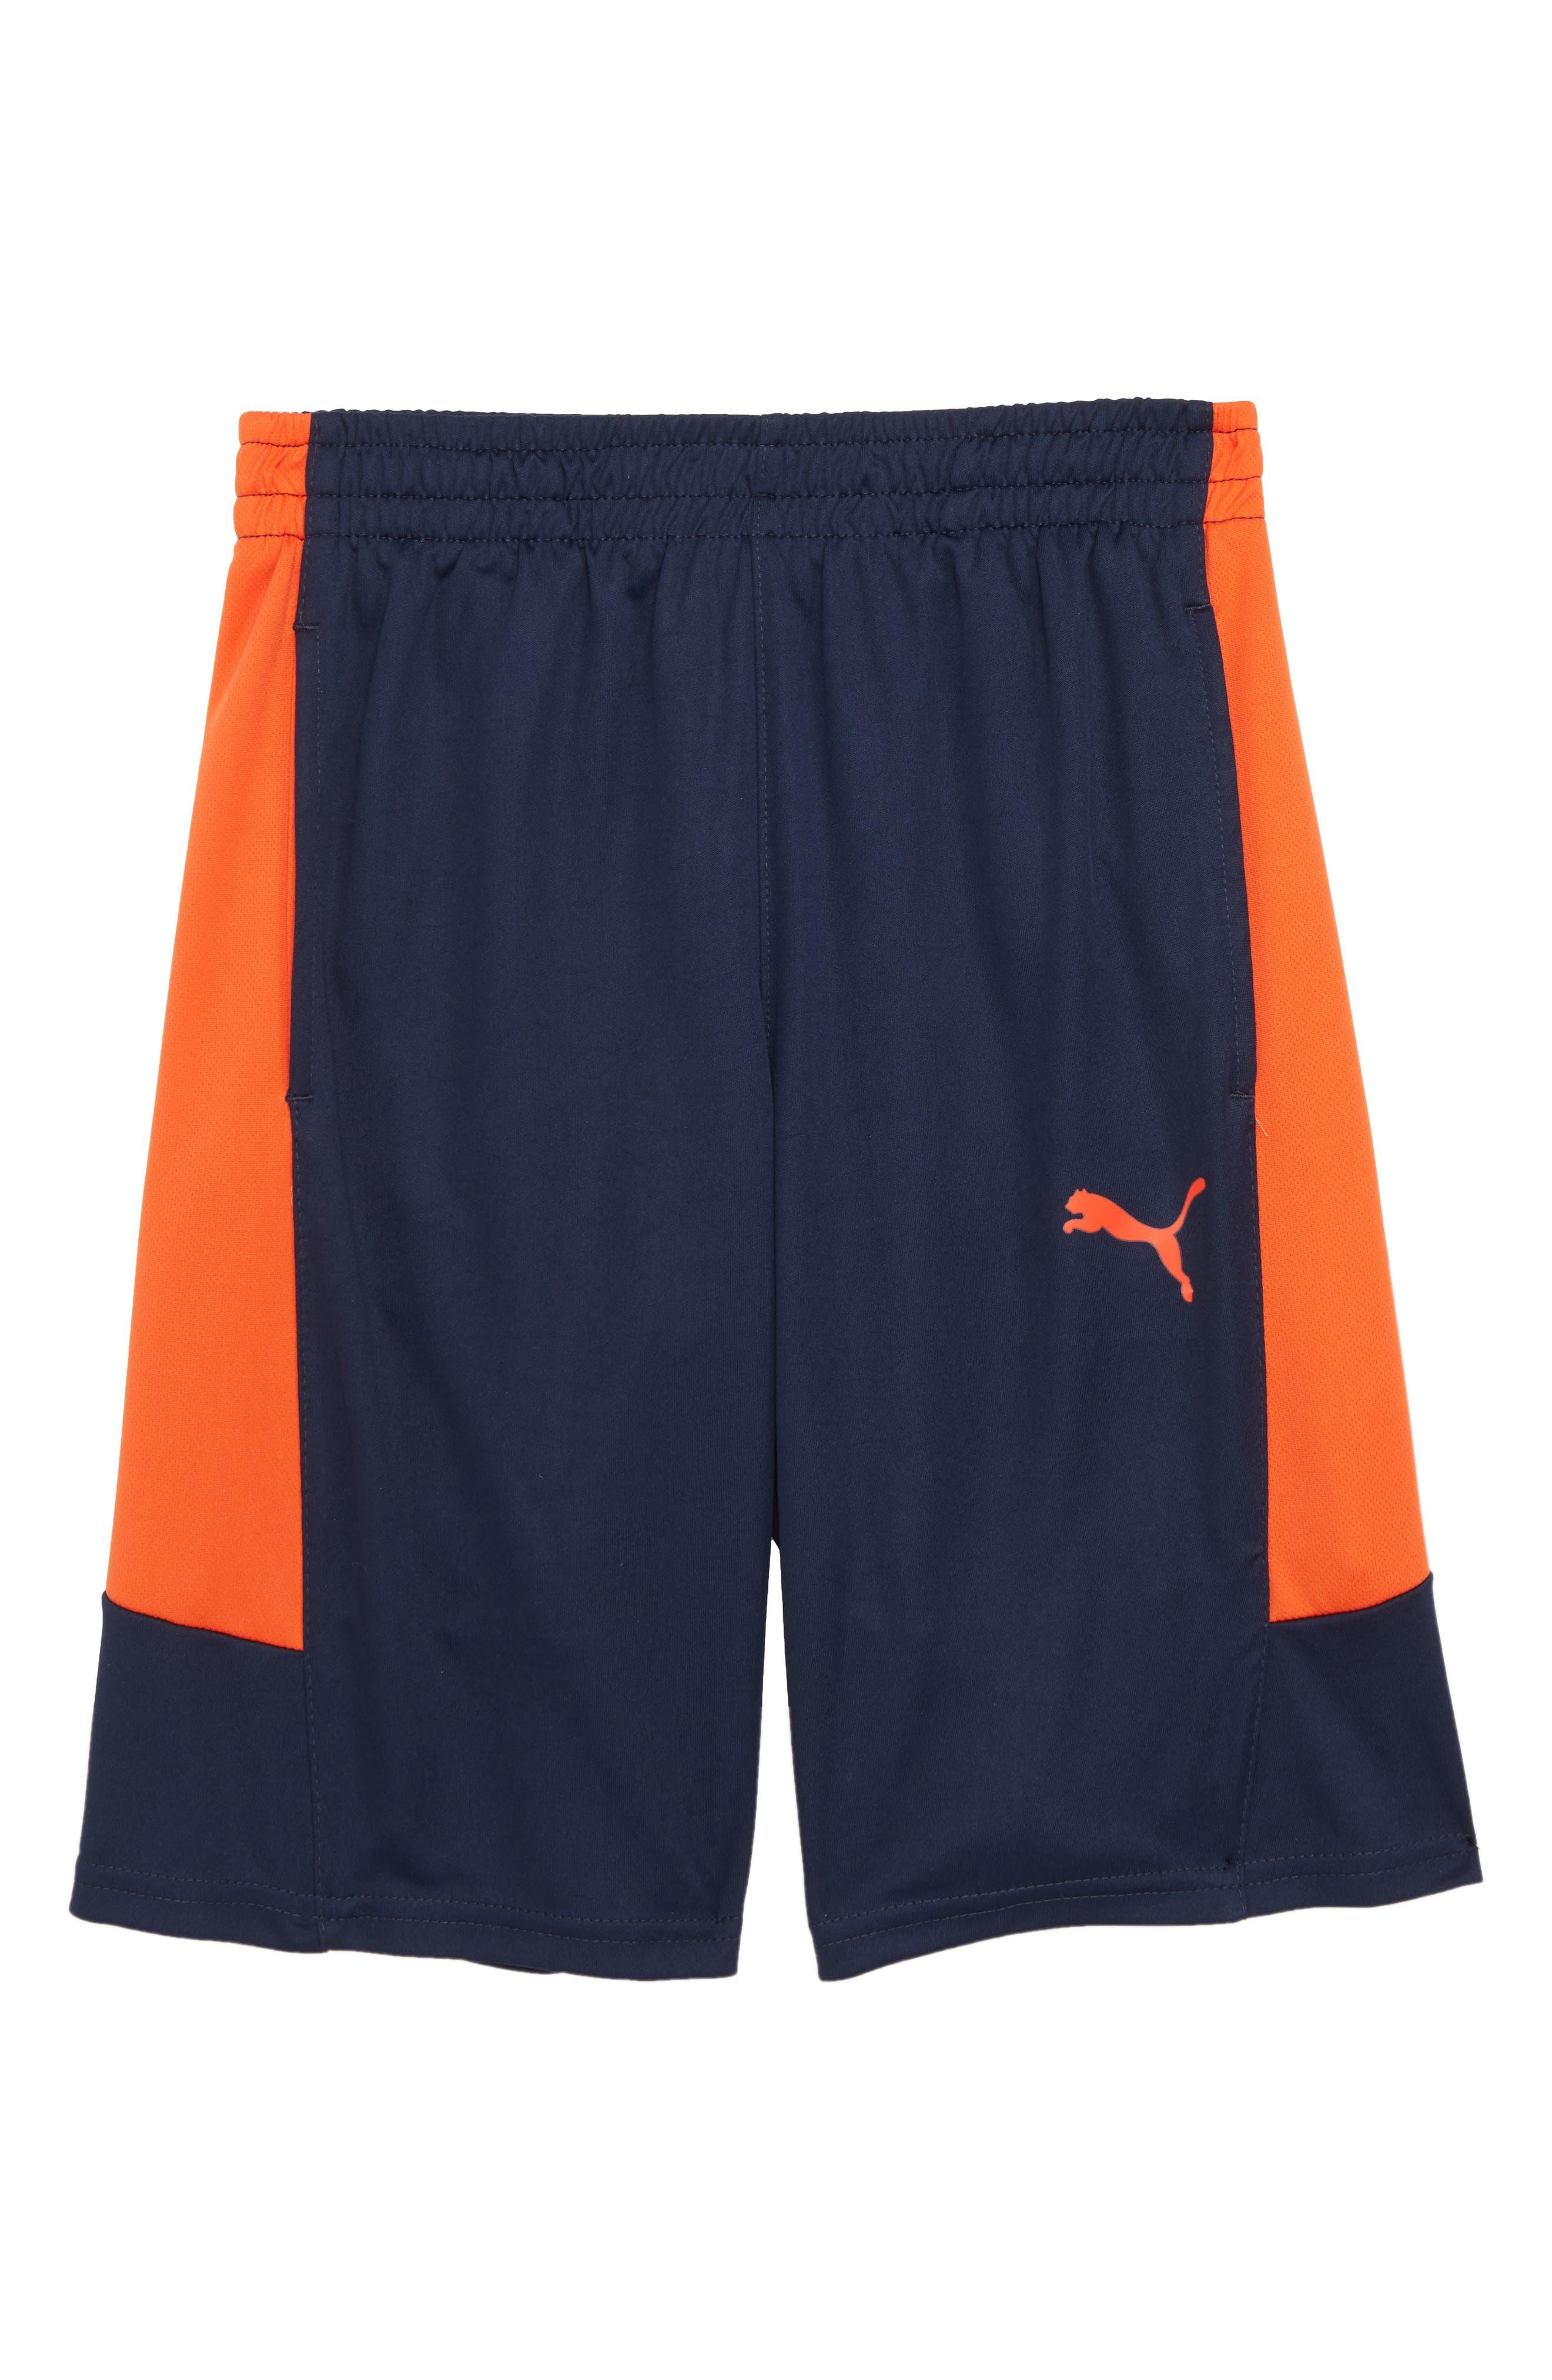 Performance Colorblock Shorts,                         Main,                         color, Pea Coat